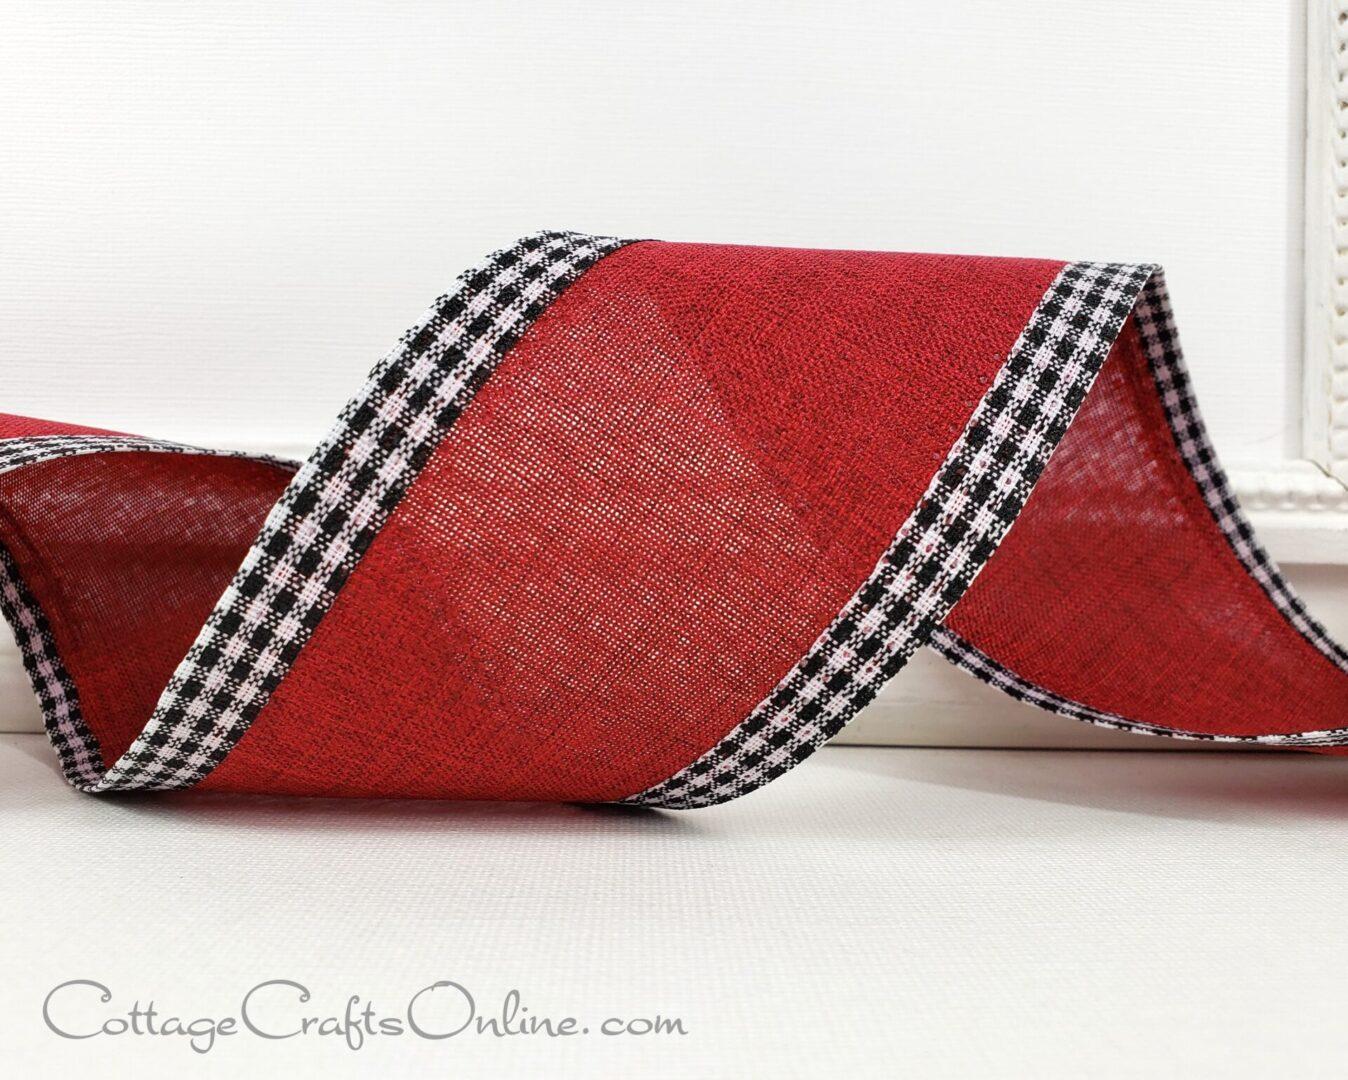 samuel burgundy red check edge linen cb rg a 109 9me-004